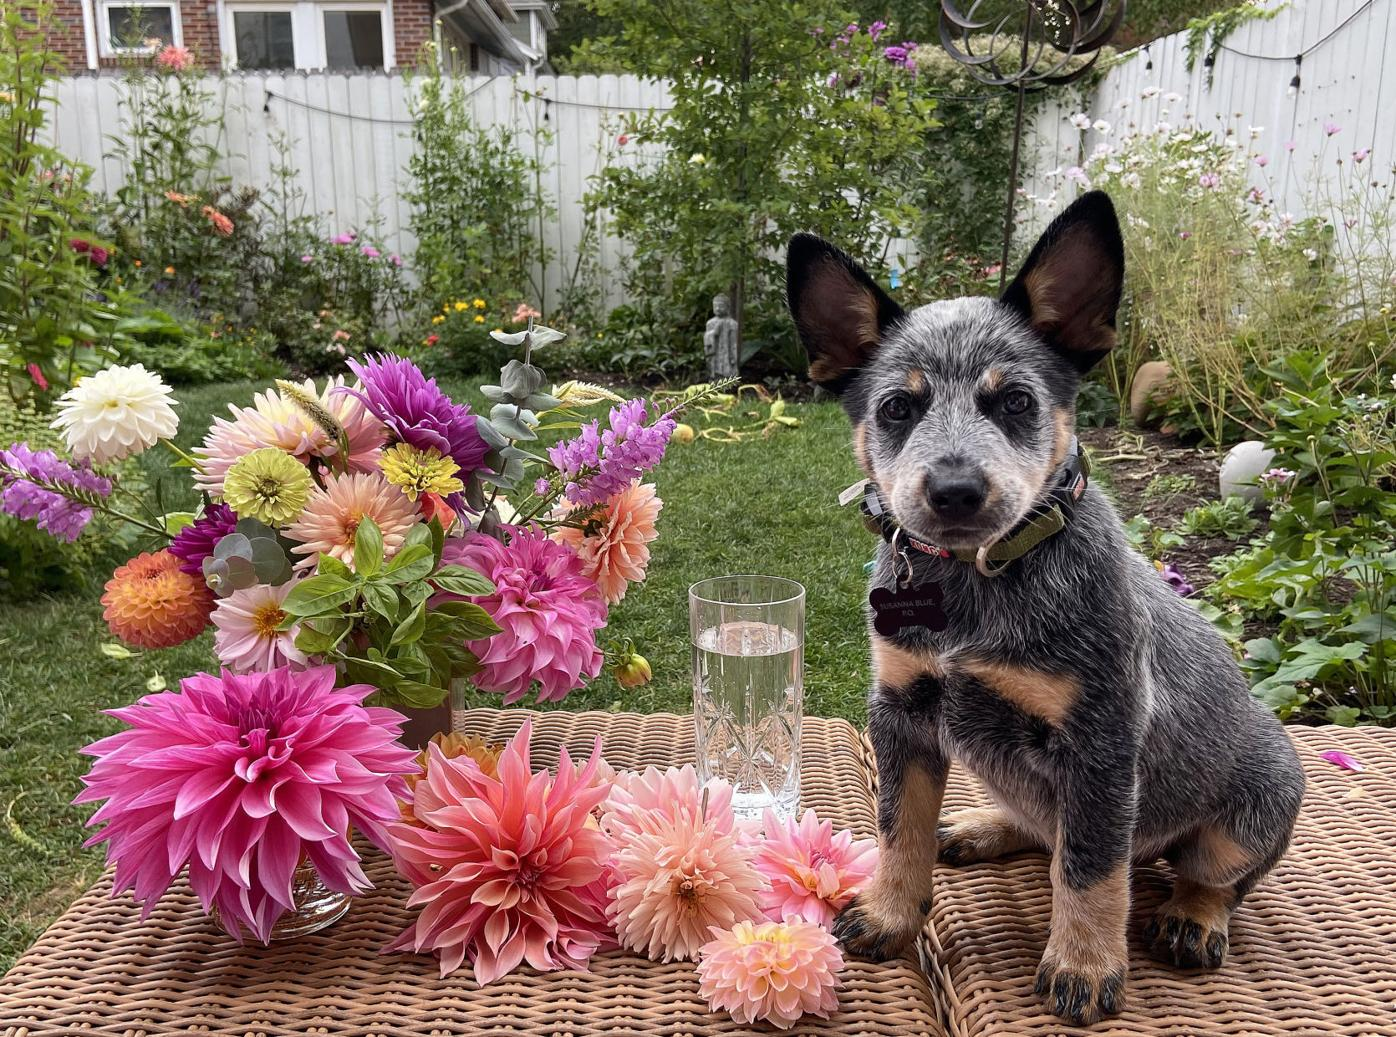 Suzy, the Australian cattle dog